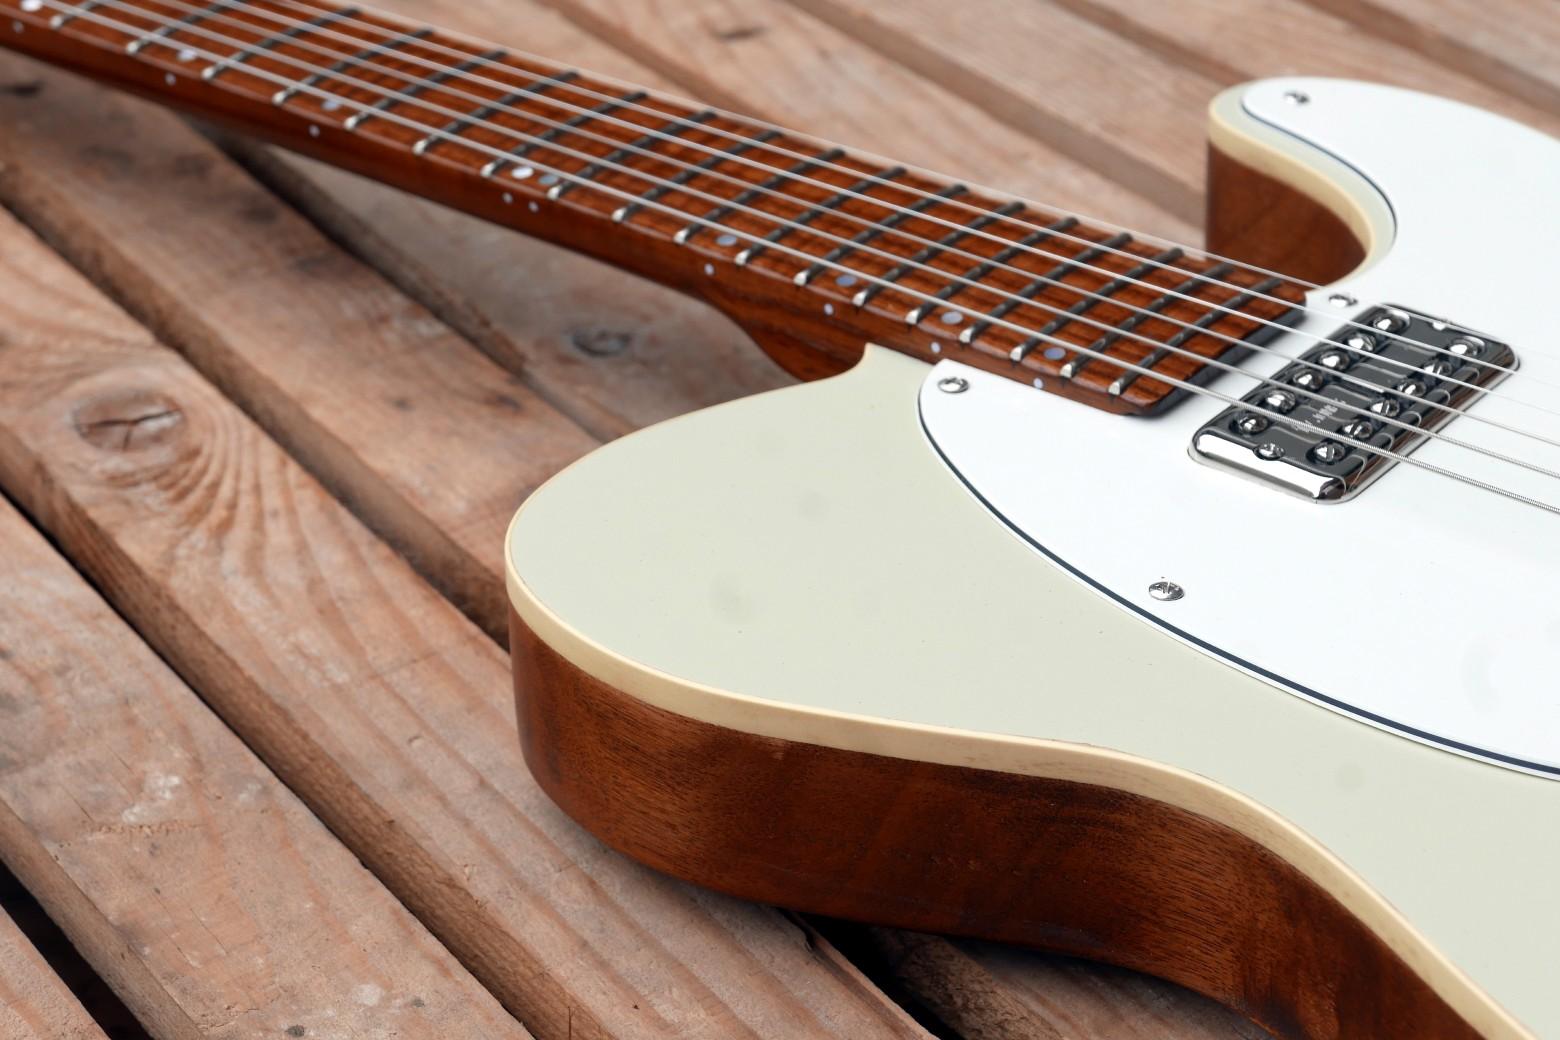 chitarra telecaster dettaglio binding